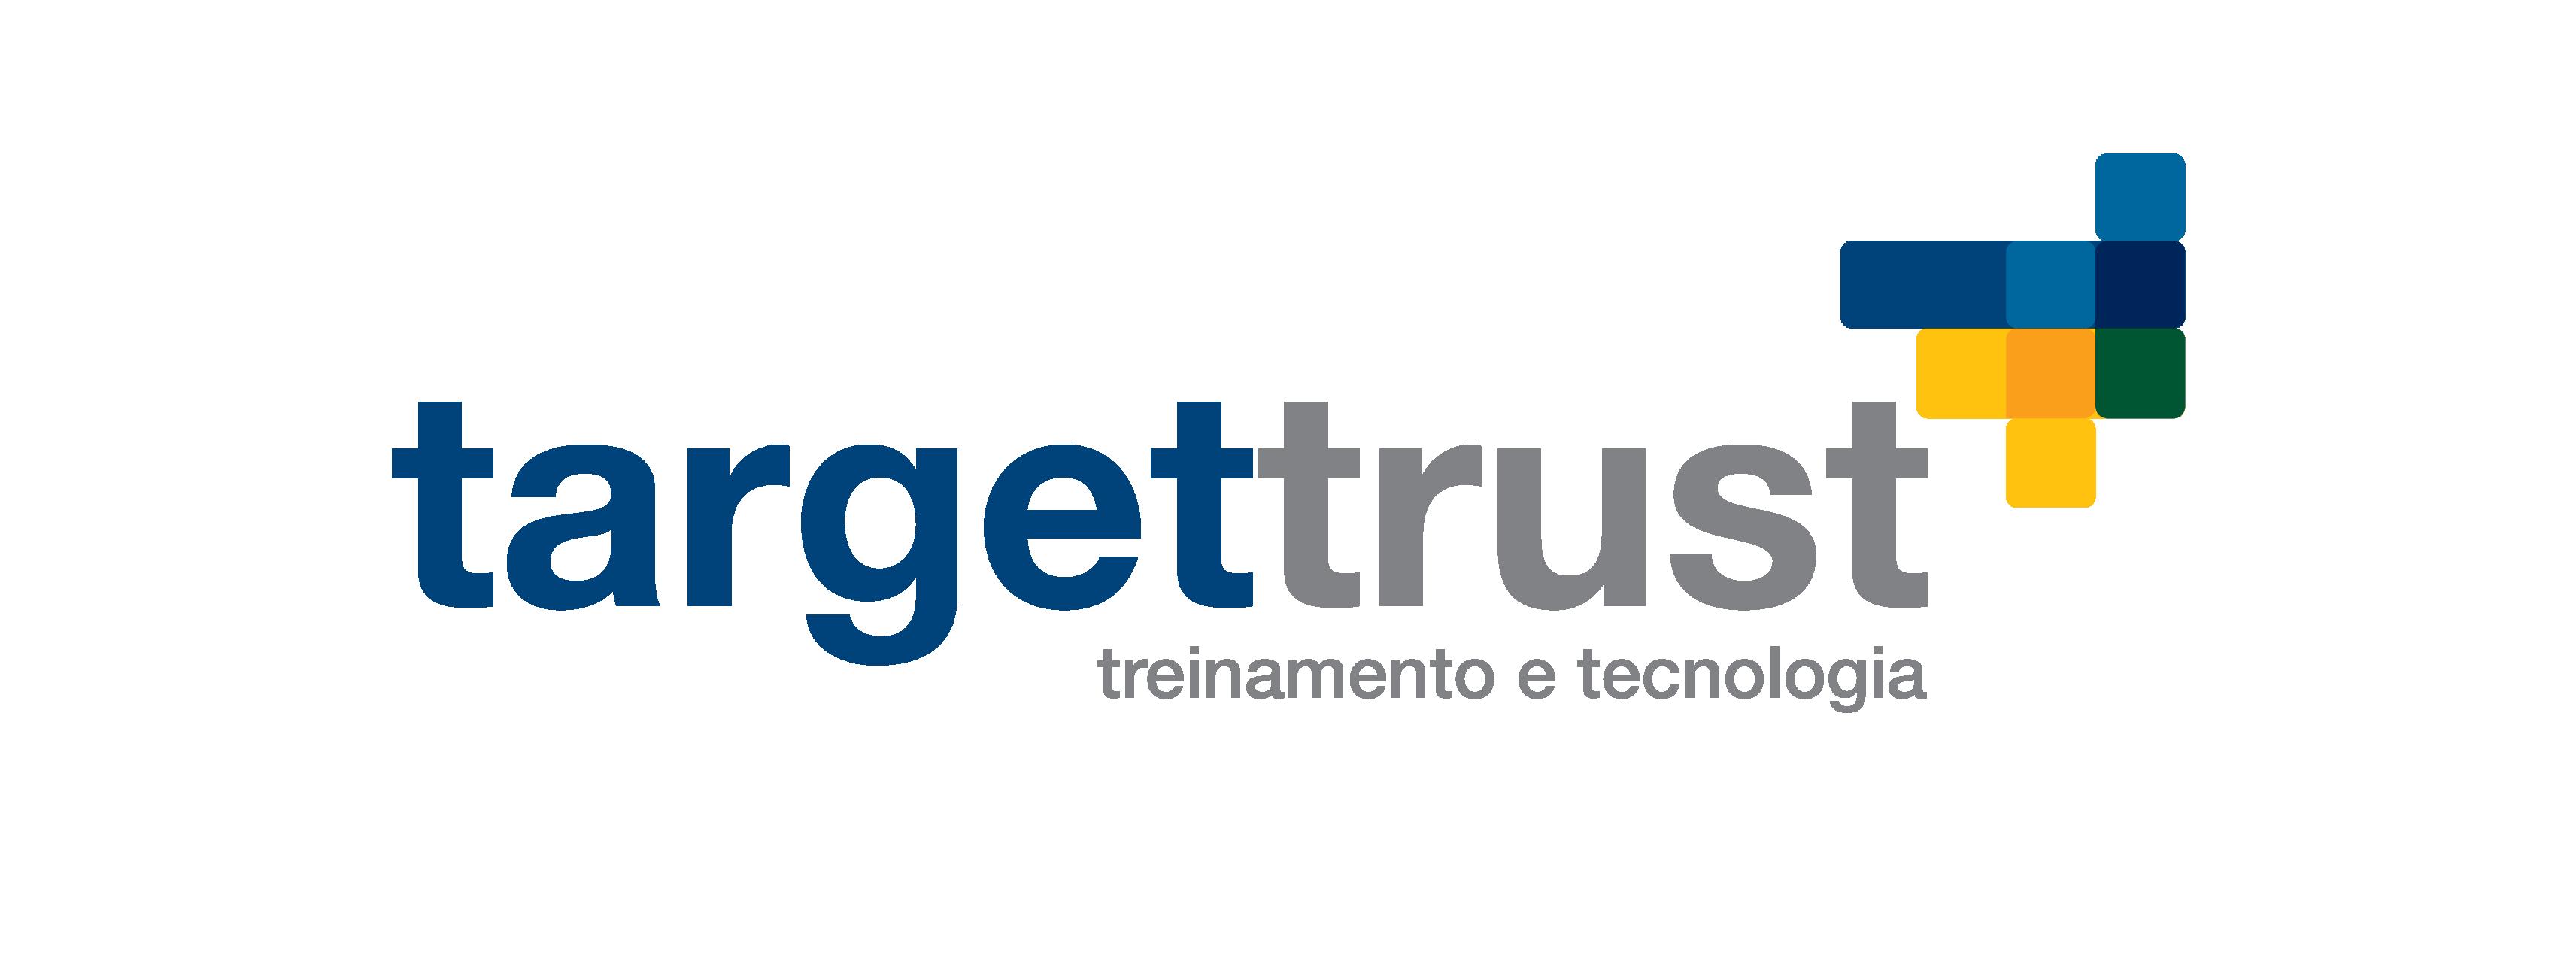 Logotipo TargetTrust